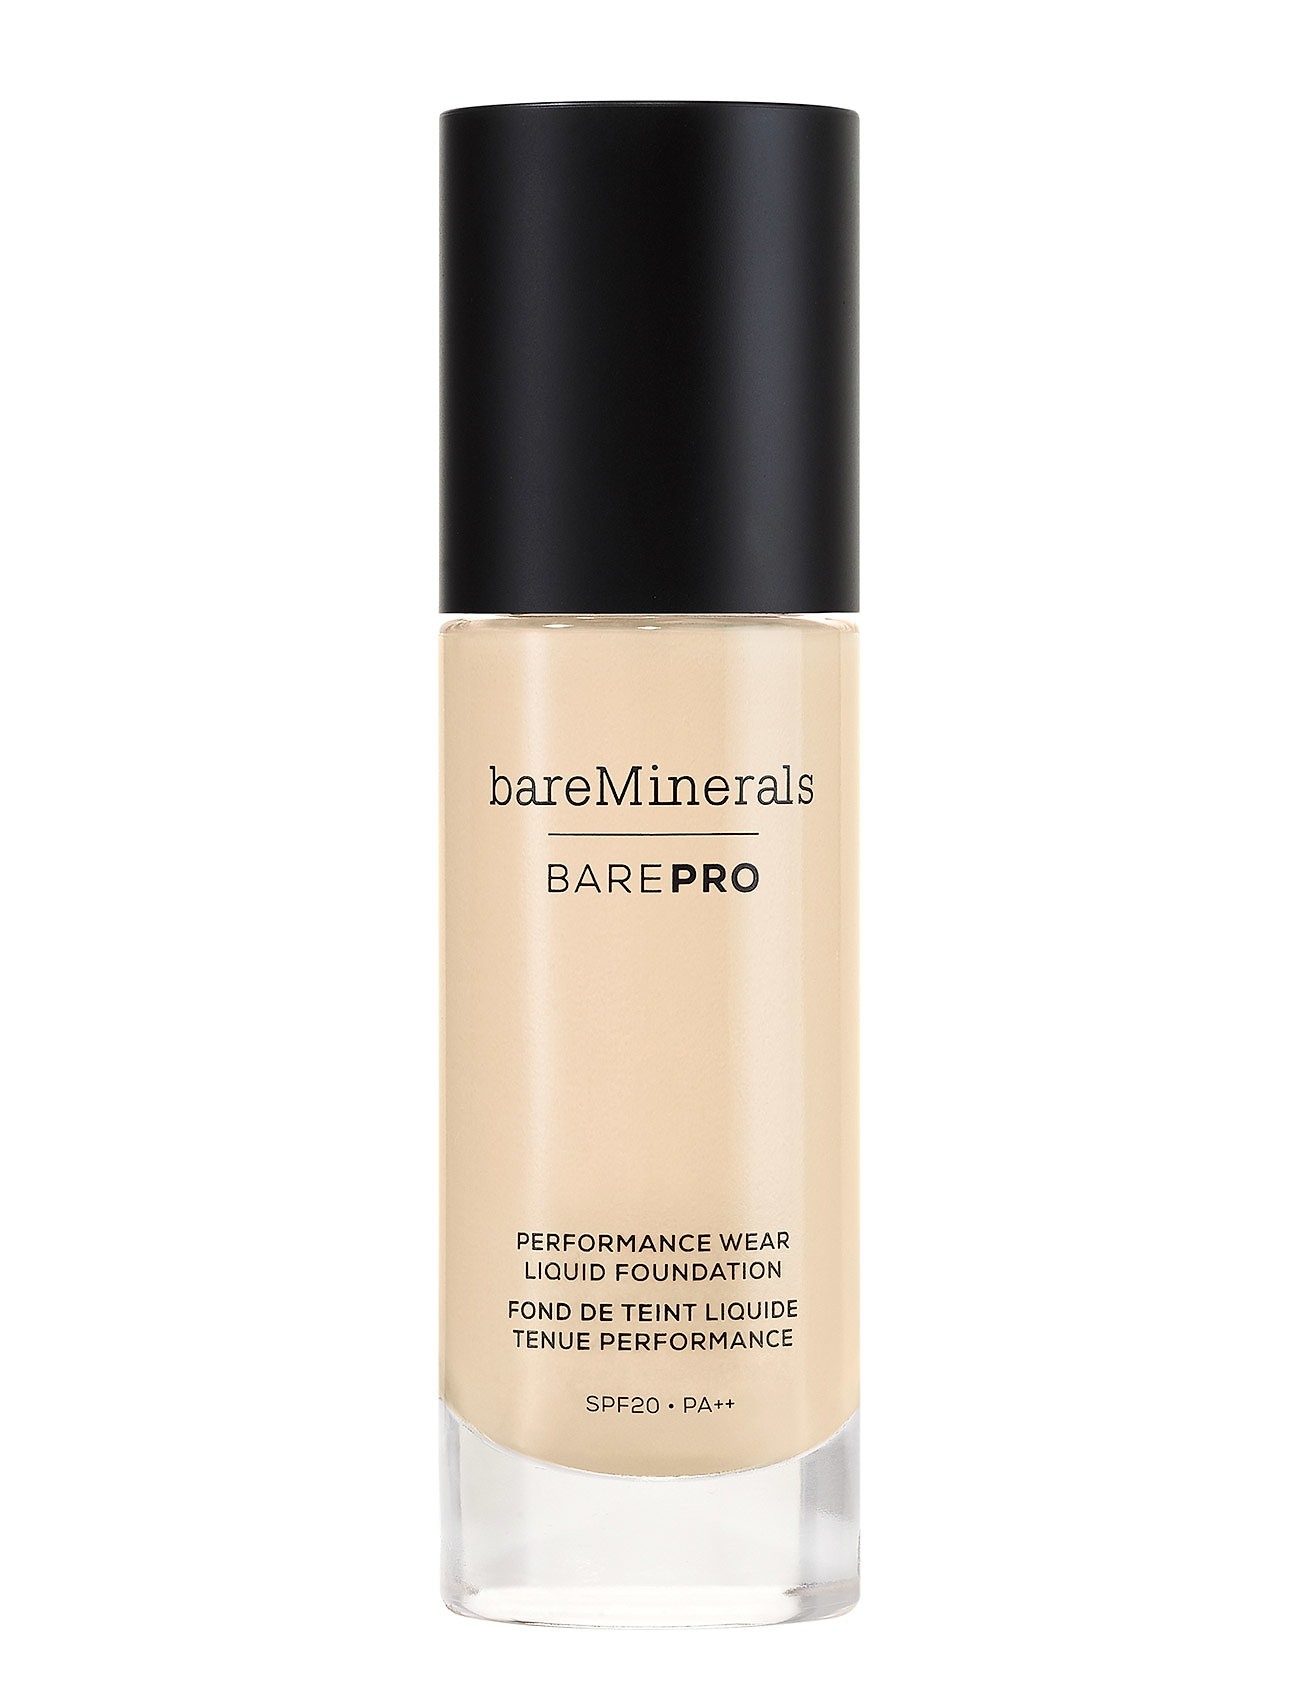 Image of Barepro Performance Wear Liquid Foundation Spf 20 Foundation Makeup BareMinerals (3067521619)